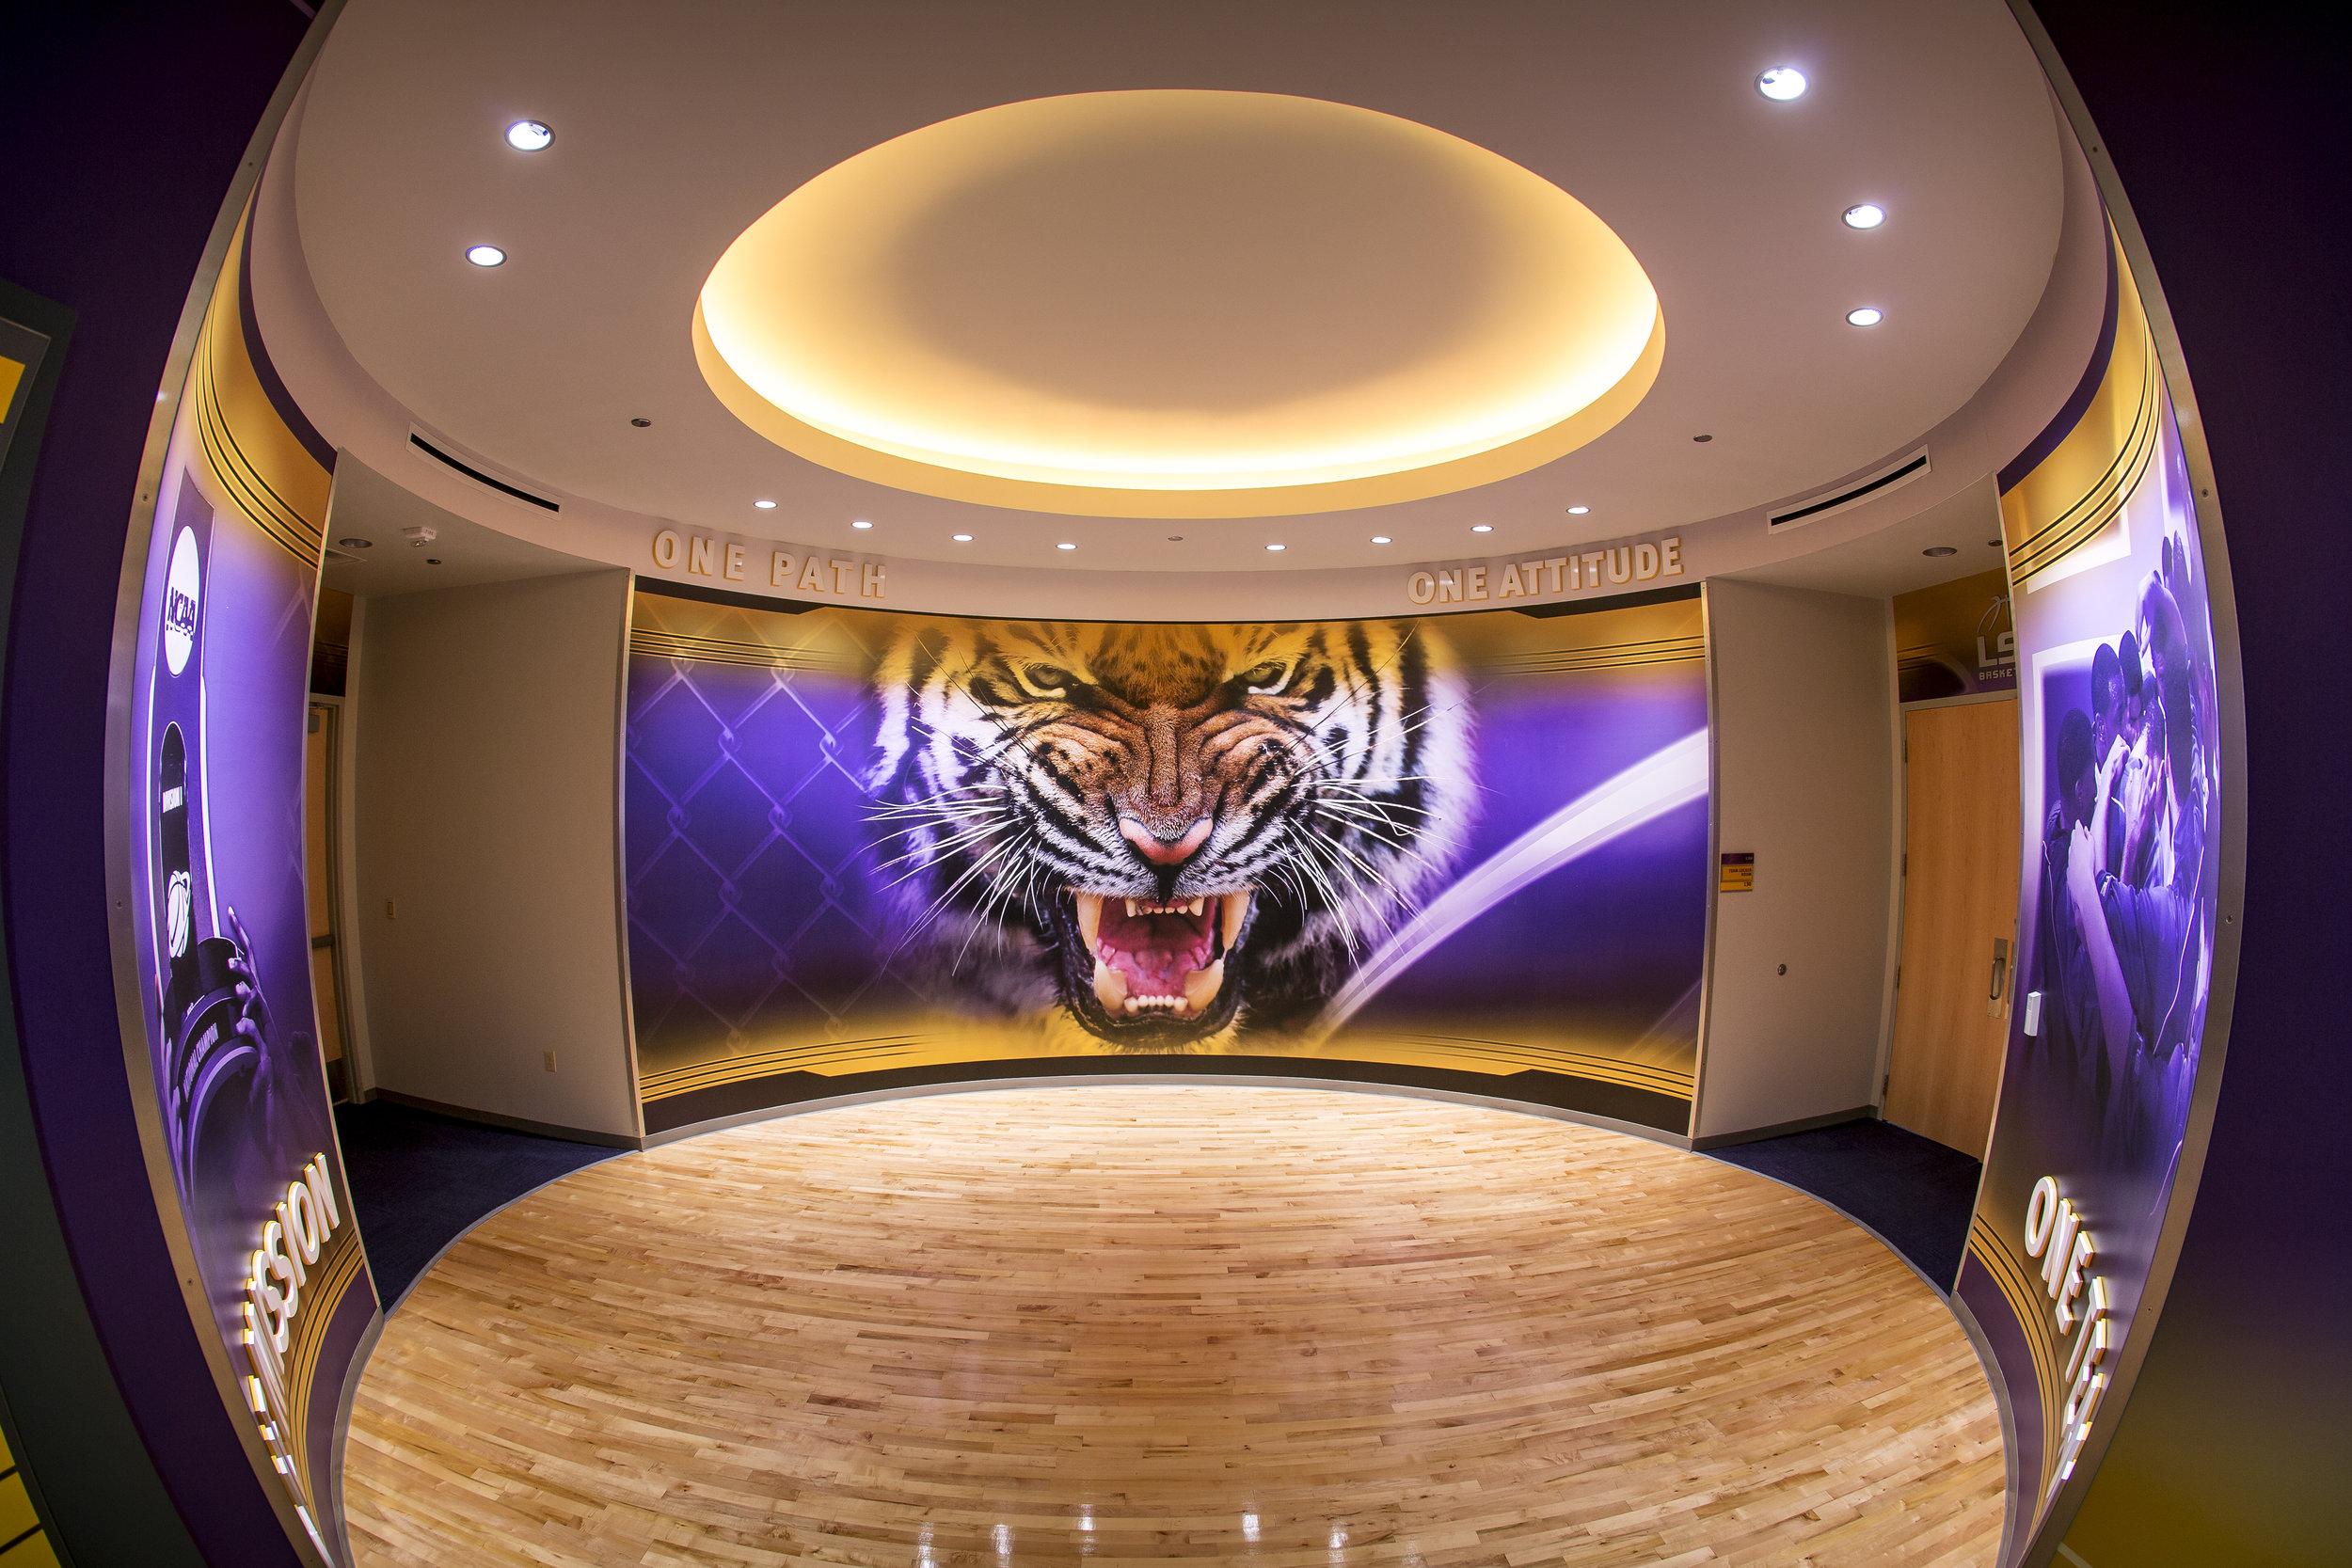 eP0169 49 Degrees - LSU Basketball Training Facility .jpg